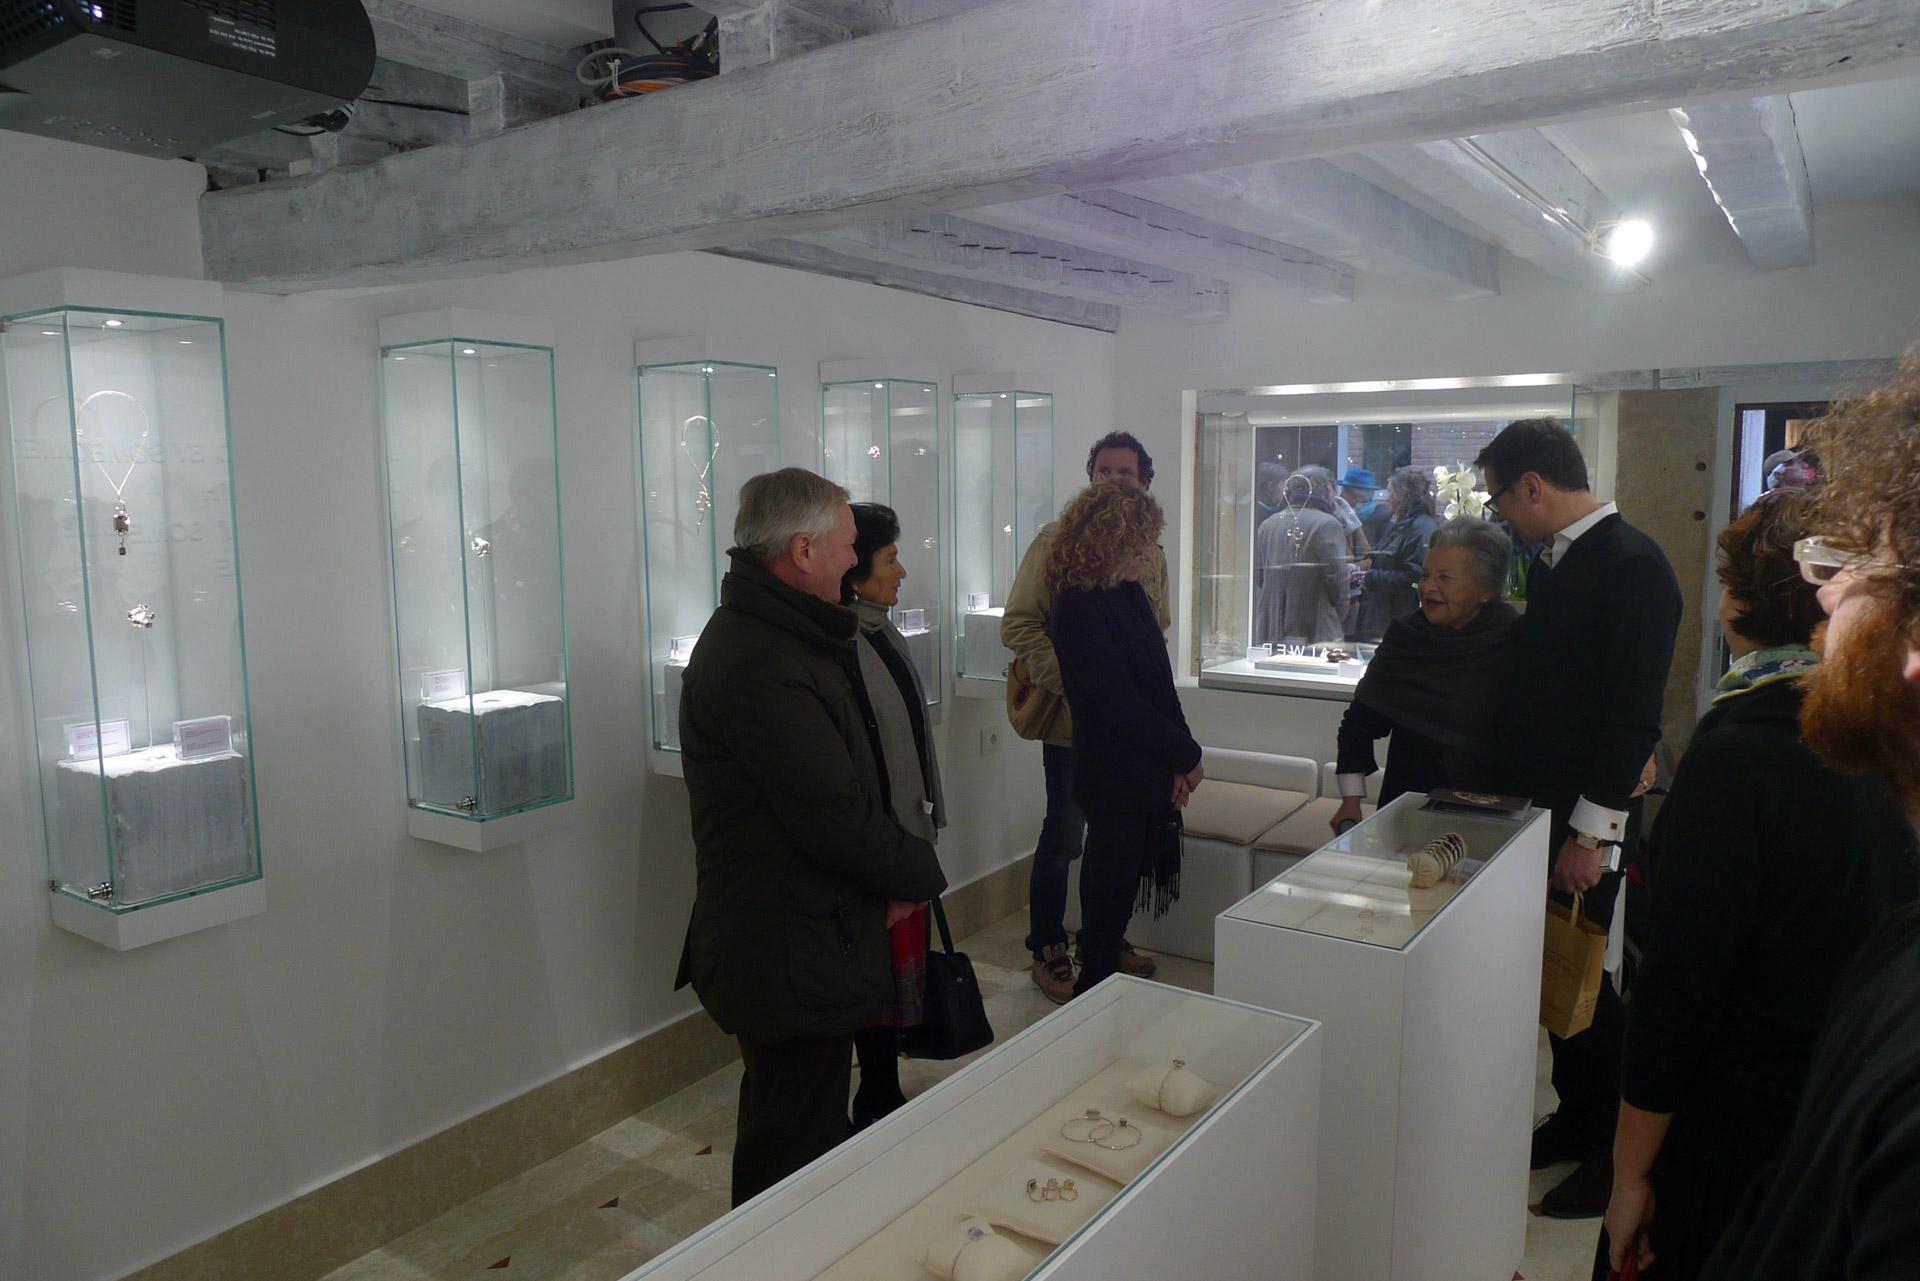 Galleria Venezia - Venice Gallery